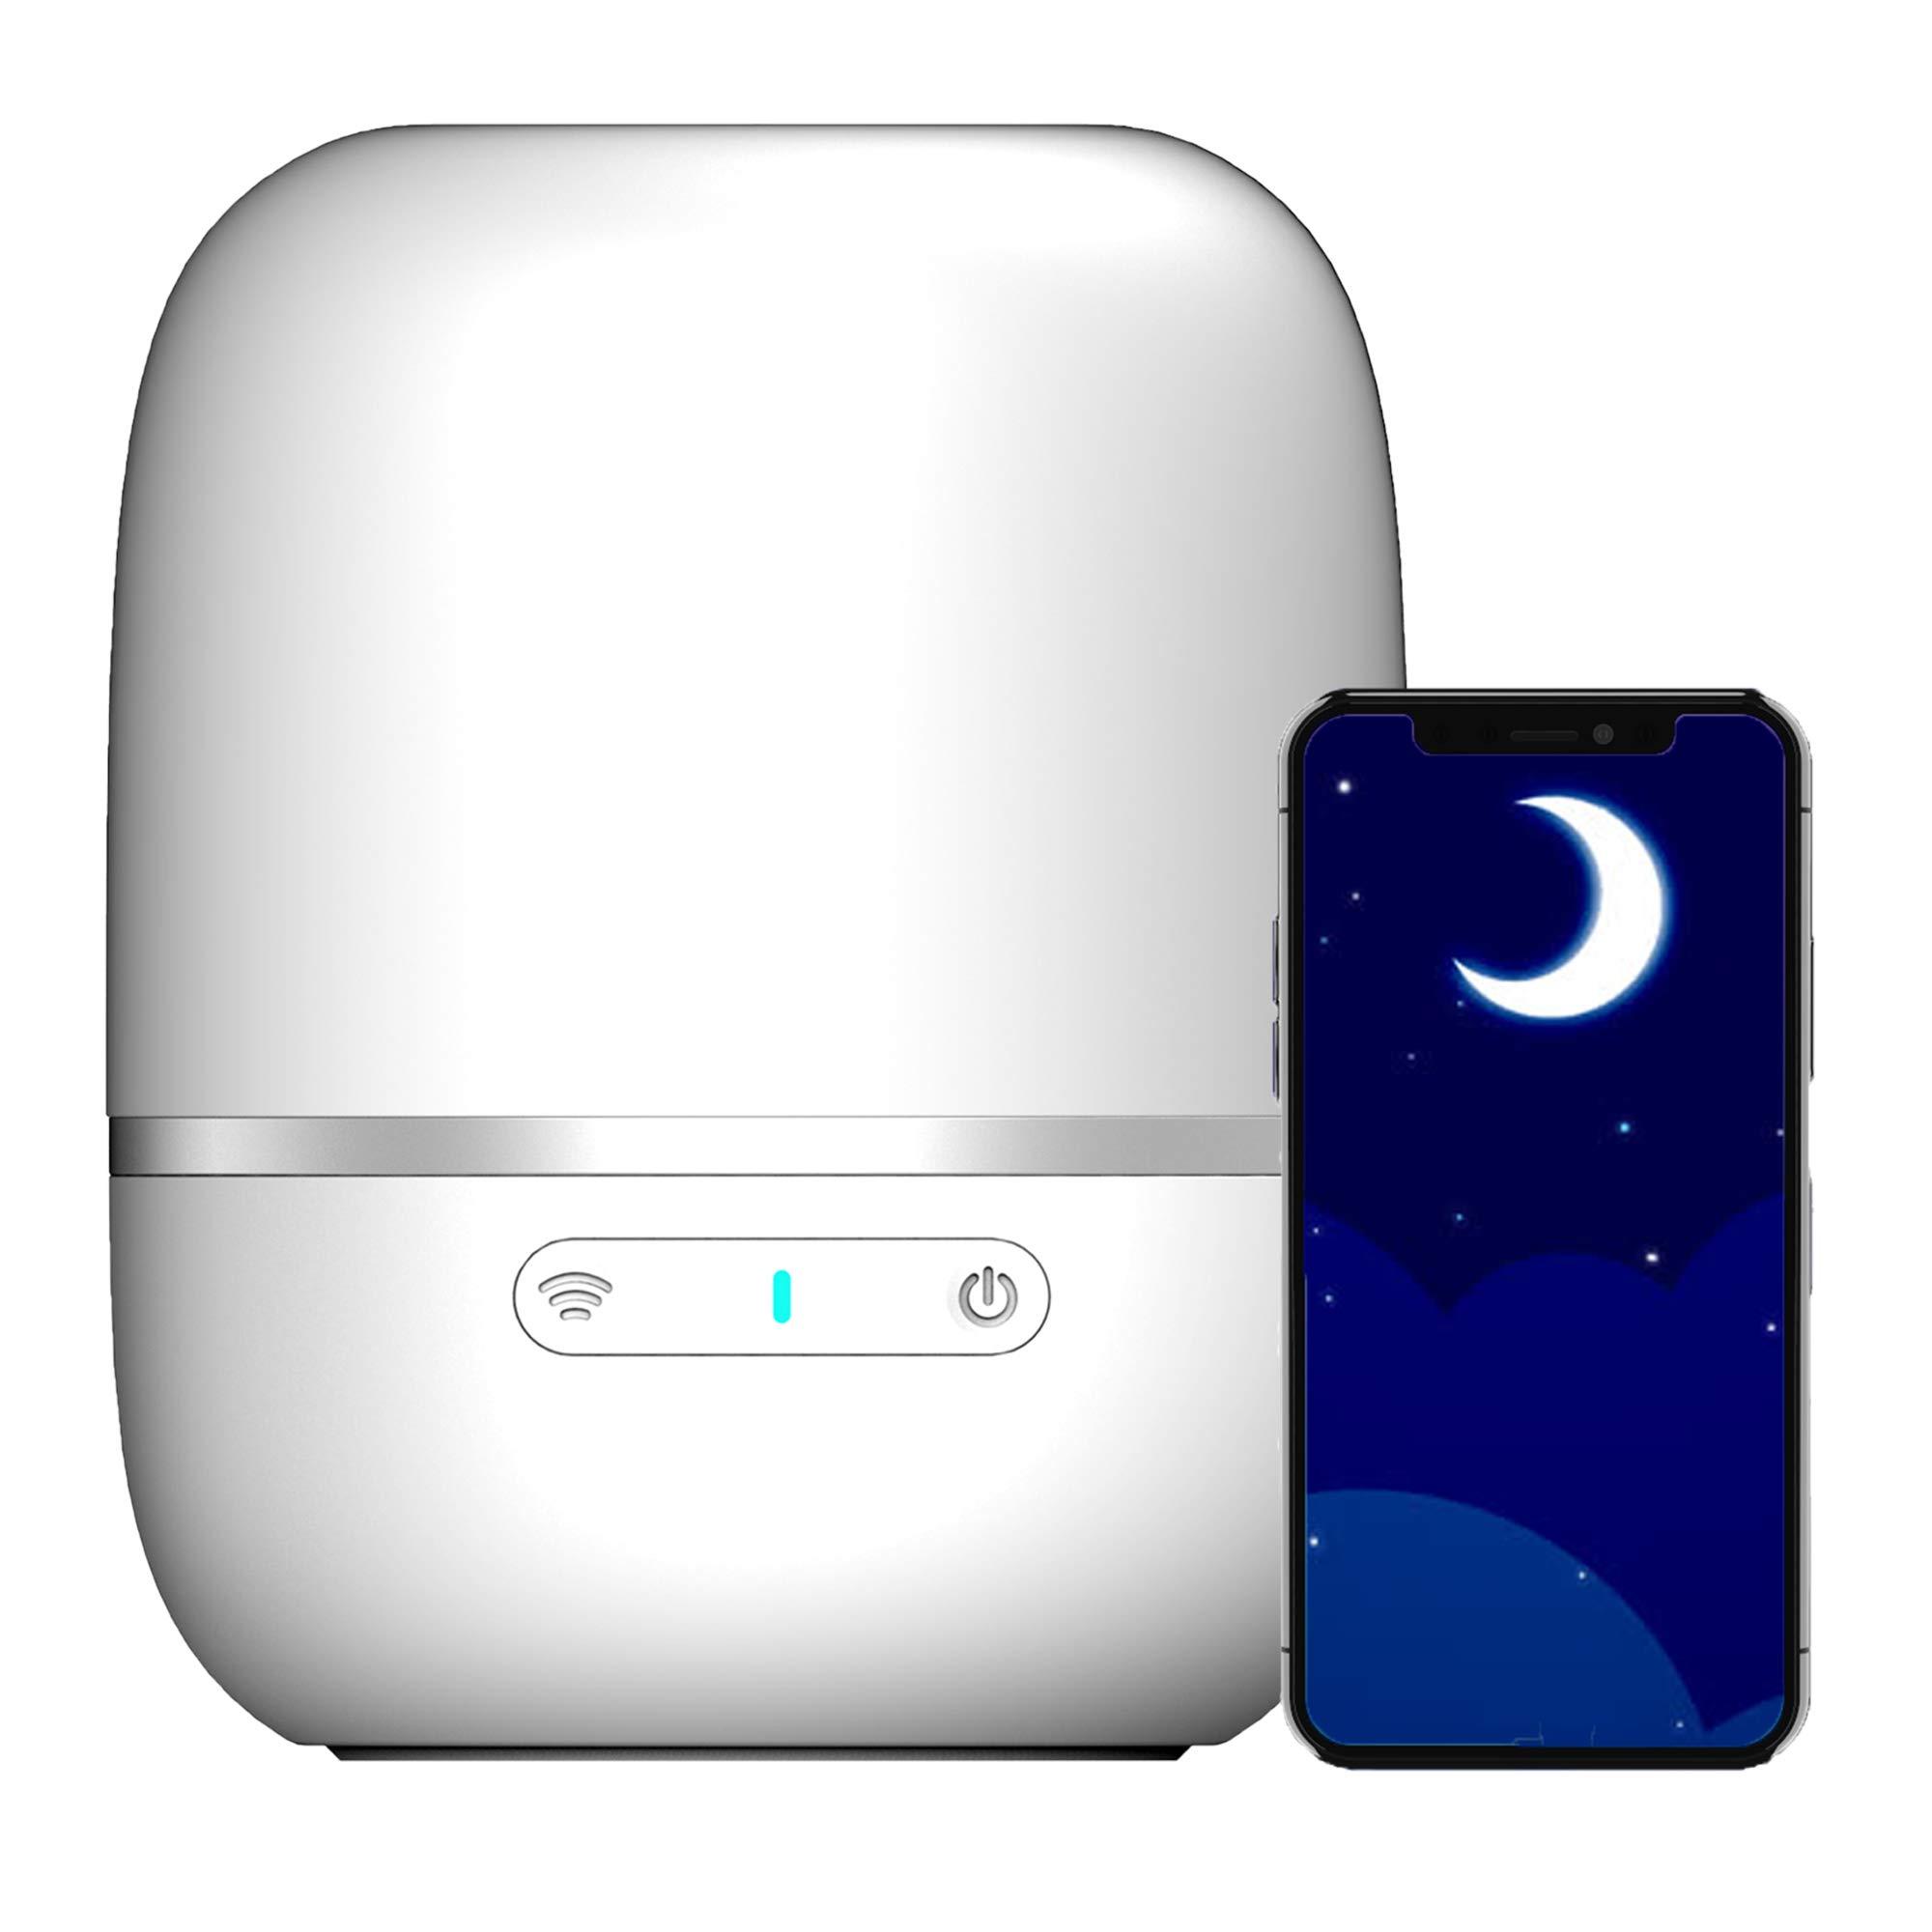 eFamily Smart Night Light for Kids, Adjustable Brightness & Soft Color, Dimmable Bulb, Multi Scene Changing, Mood Enhancing, Touch Control, Timer Setting, for Bedside Bedroom Toddler